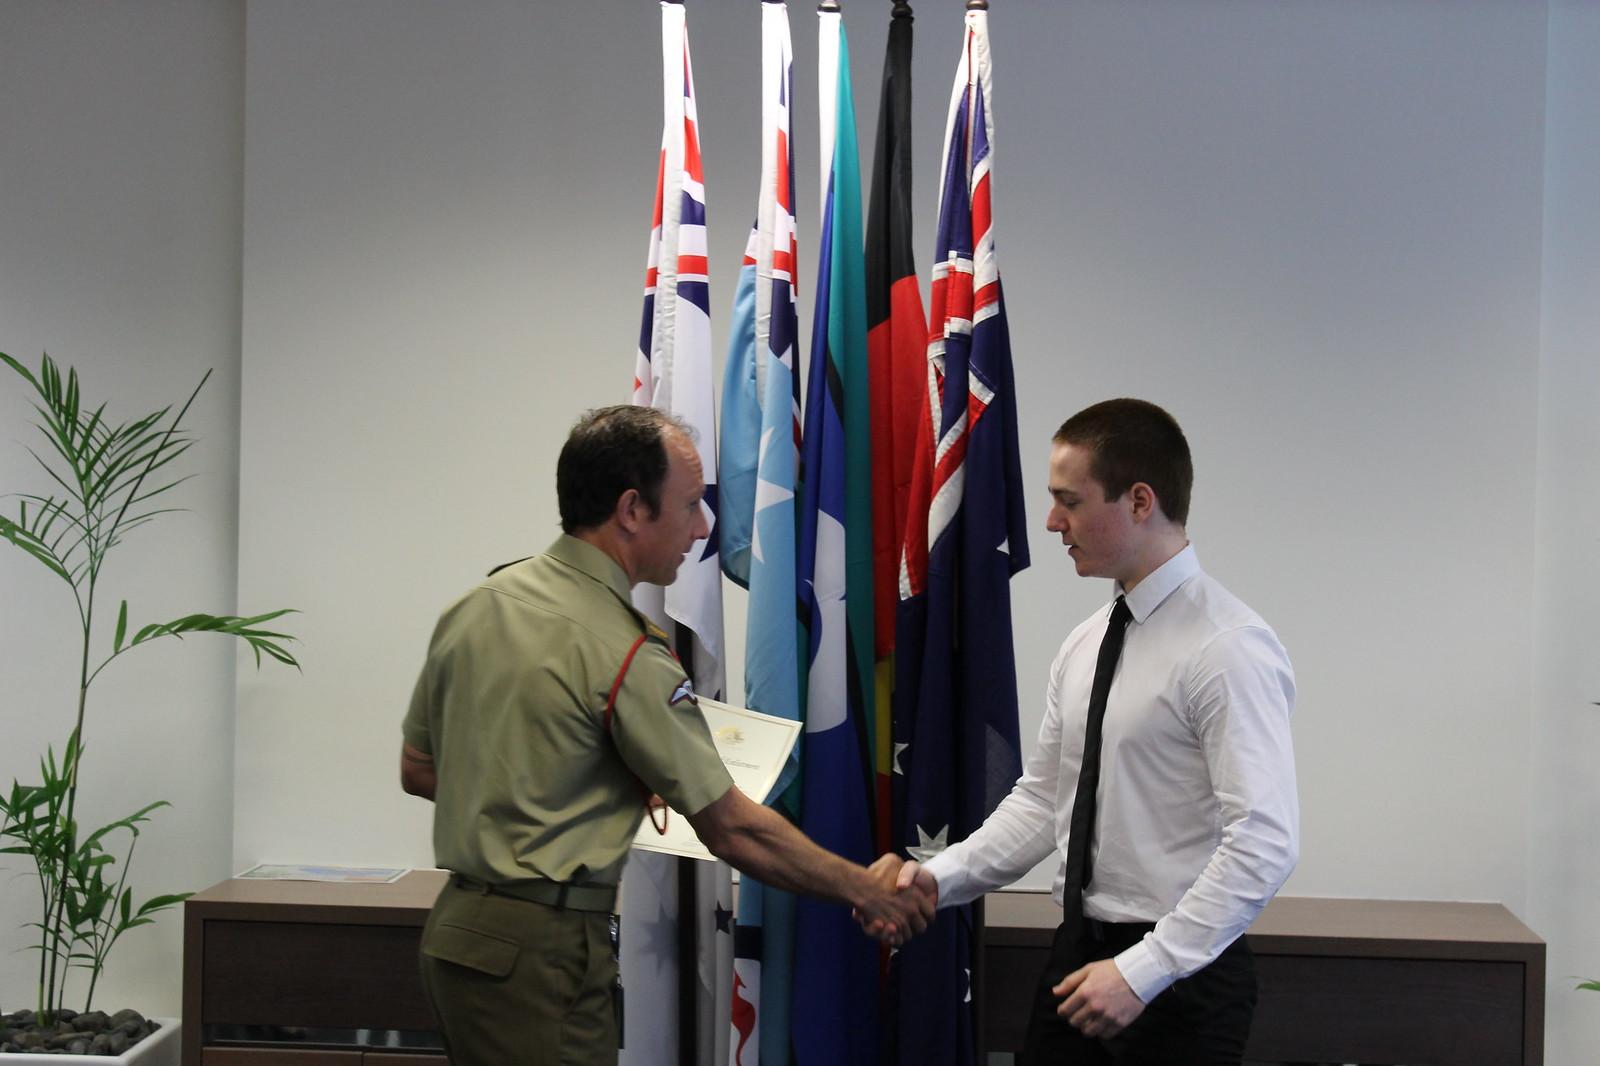 ADF Ceremony 08.10.18